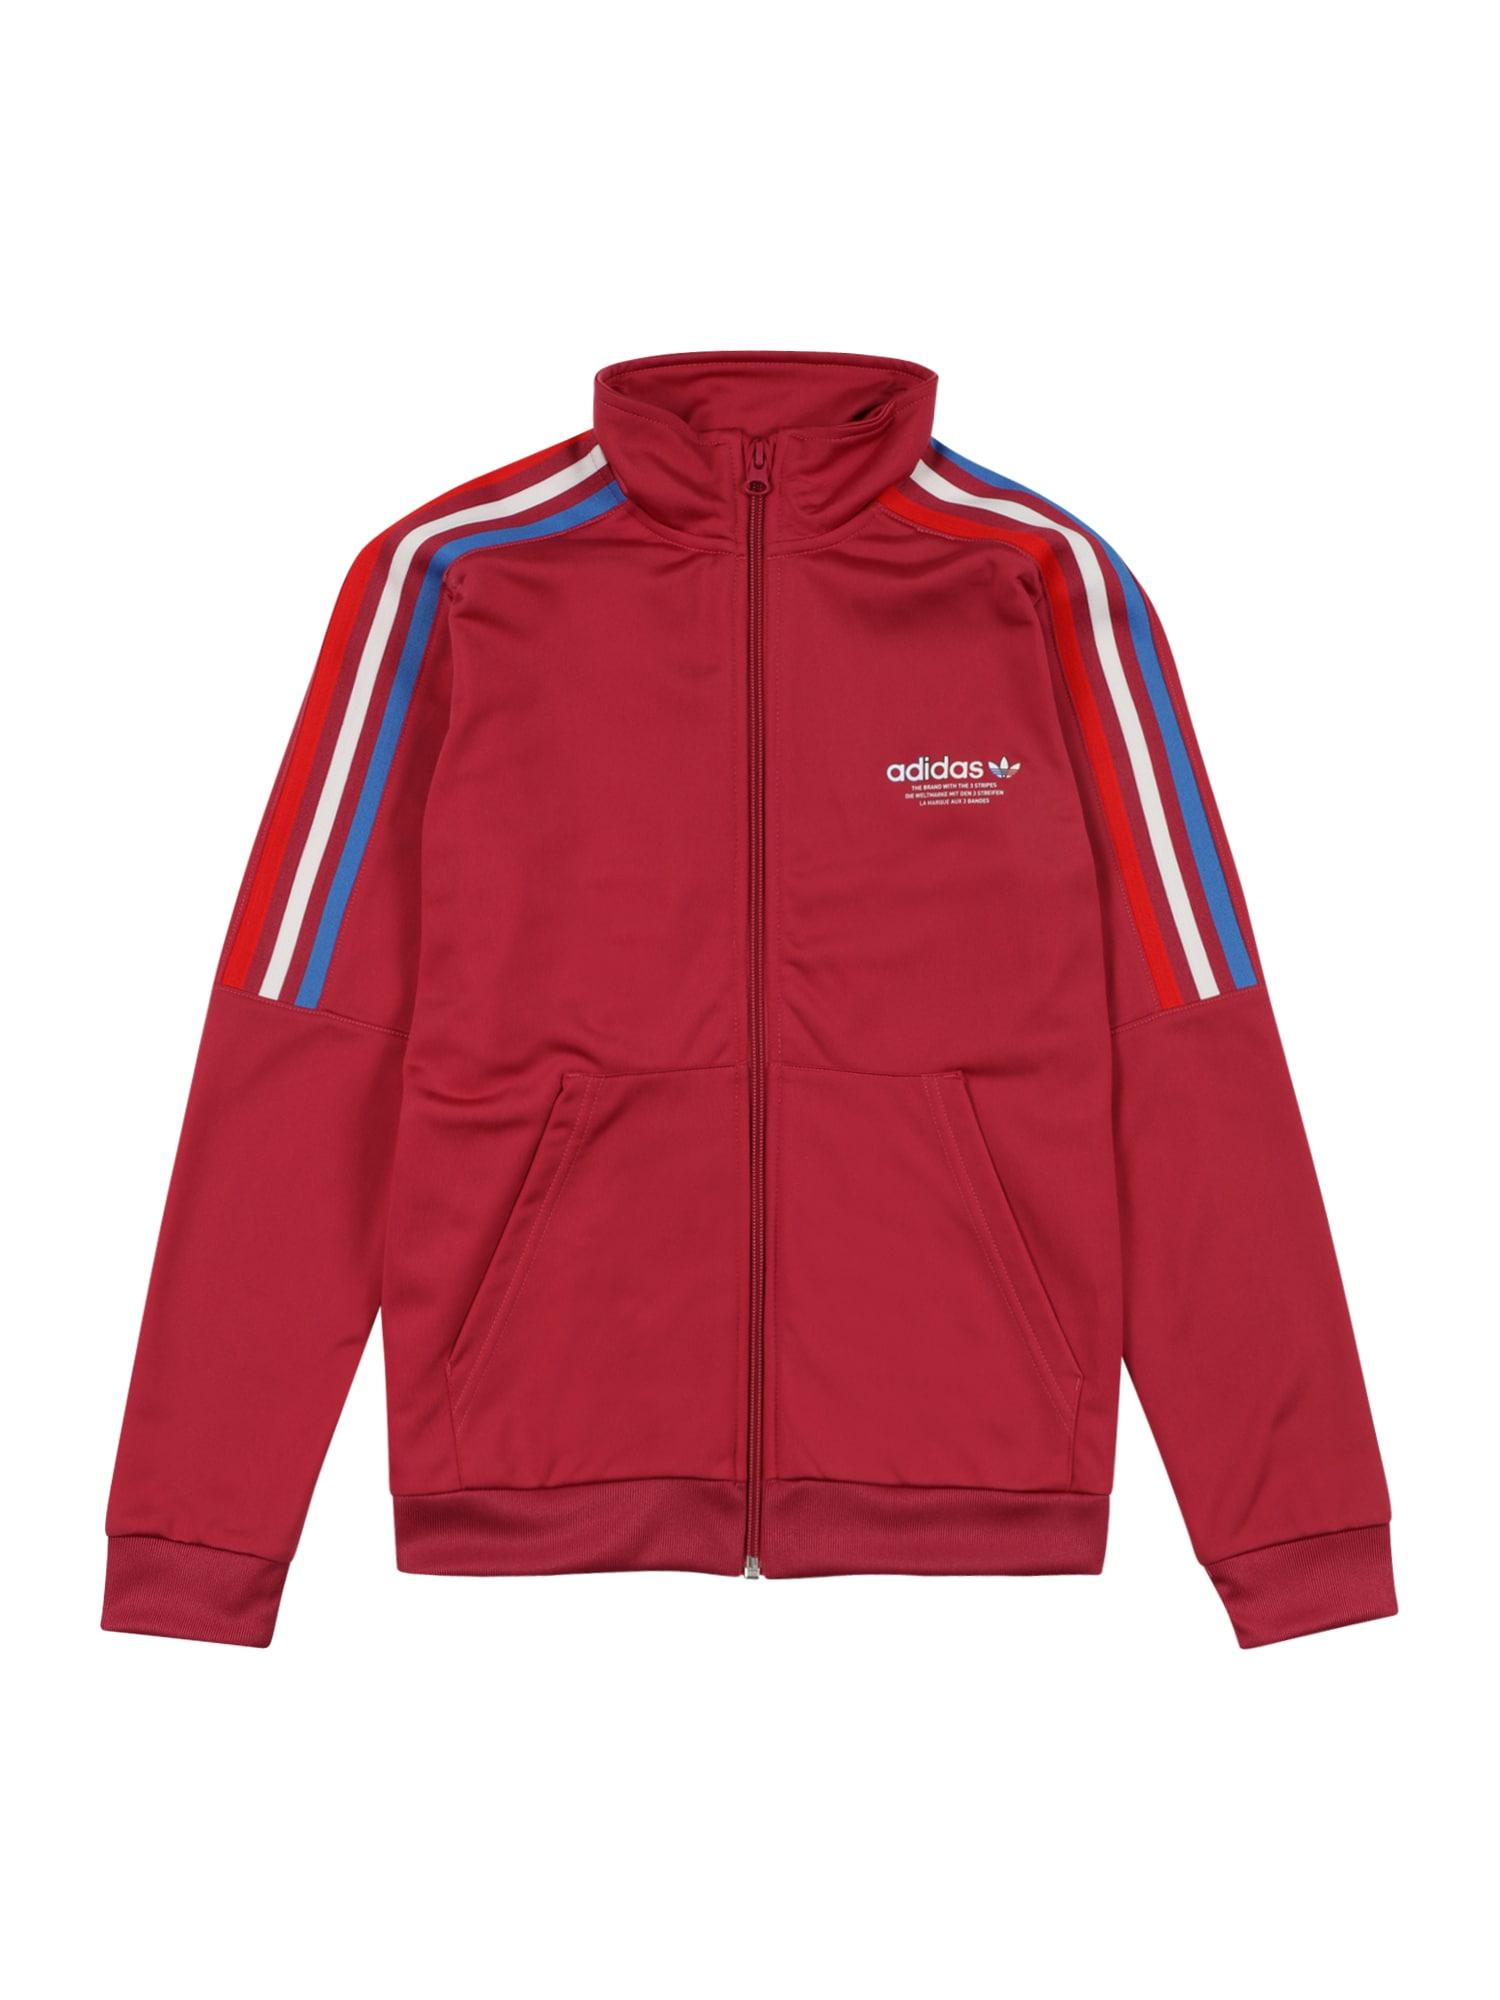 ADIDAS ORIGINALS Džemperis 'Adicolor Originals' rožinė / balta / raudona / mėlyna